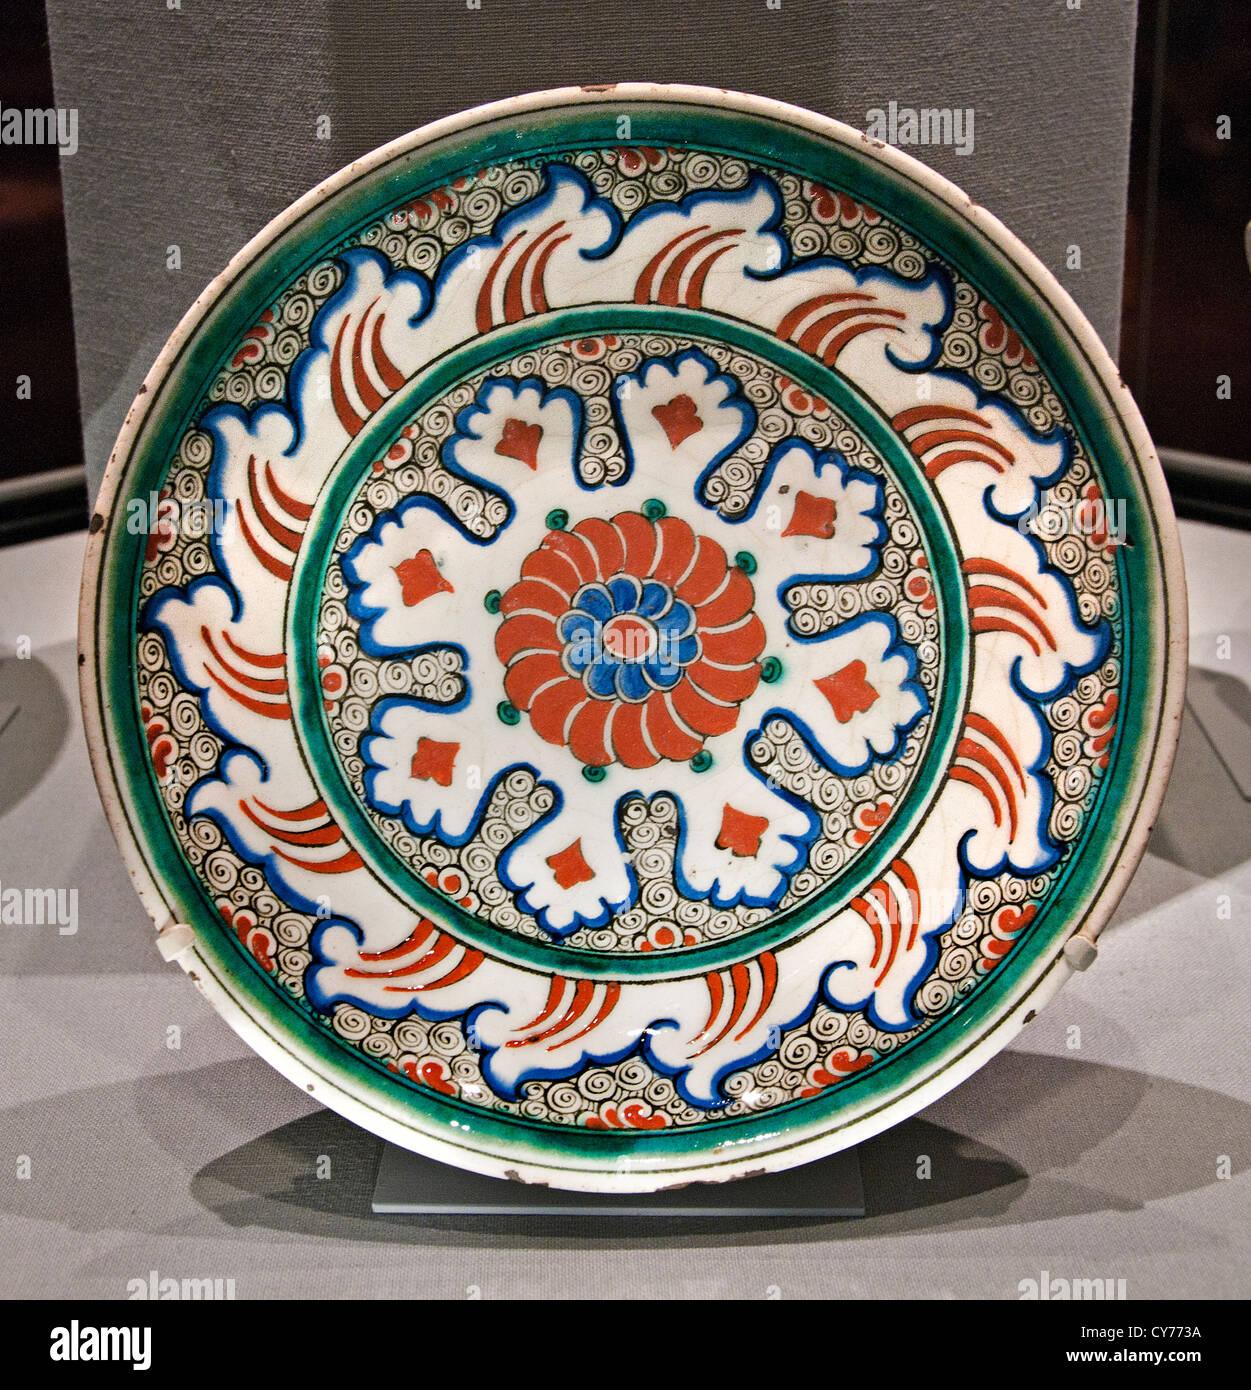 Stonepaste Iznik plat Ottoman avec conception Kaléidoscope 1585 - 1590 stonepaste Iznik Turquie plaque dindes Photo Stock